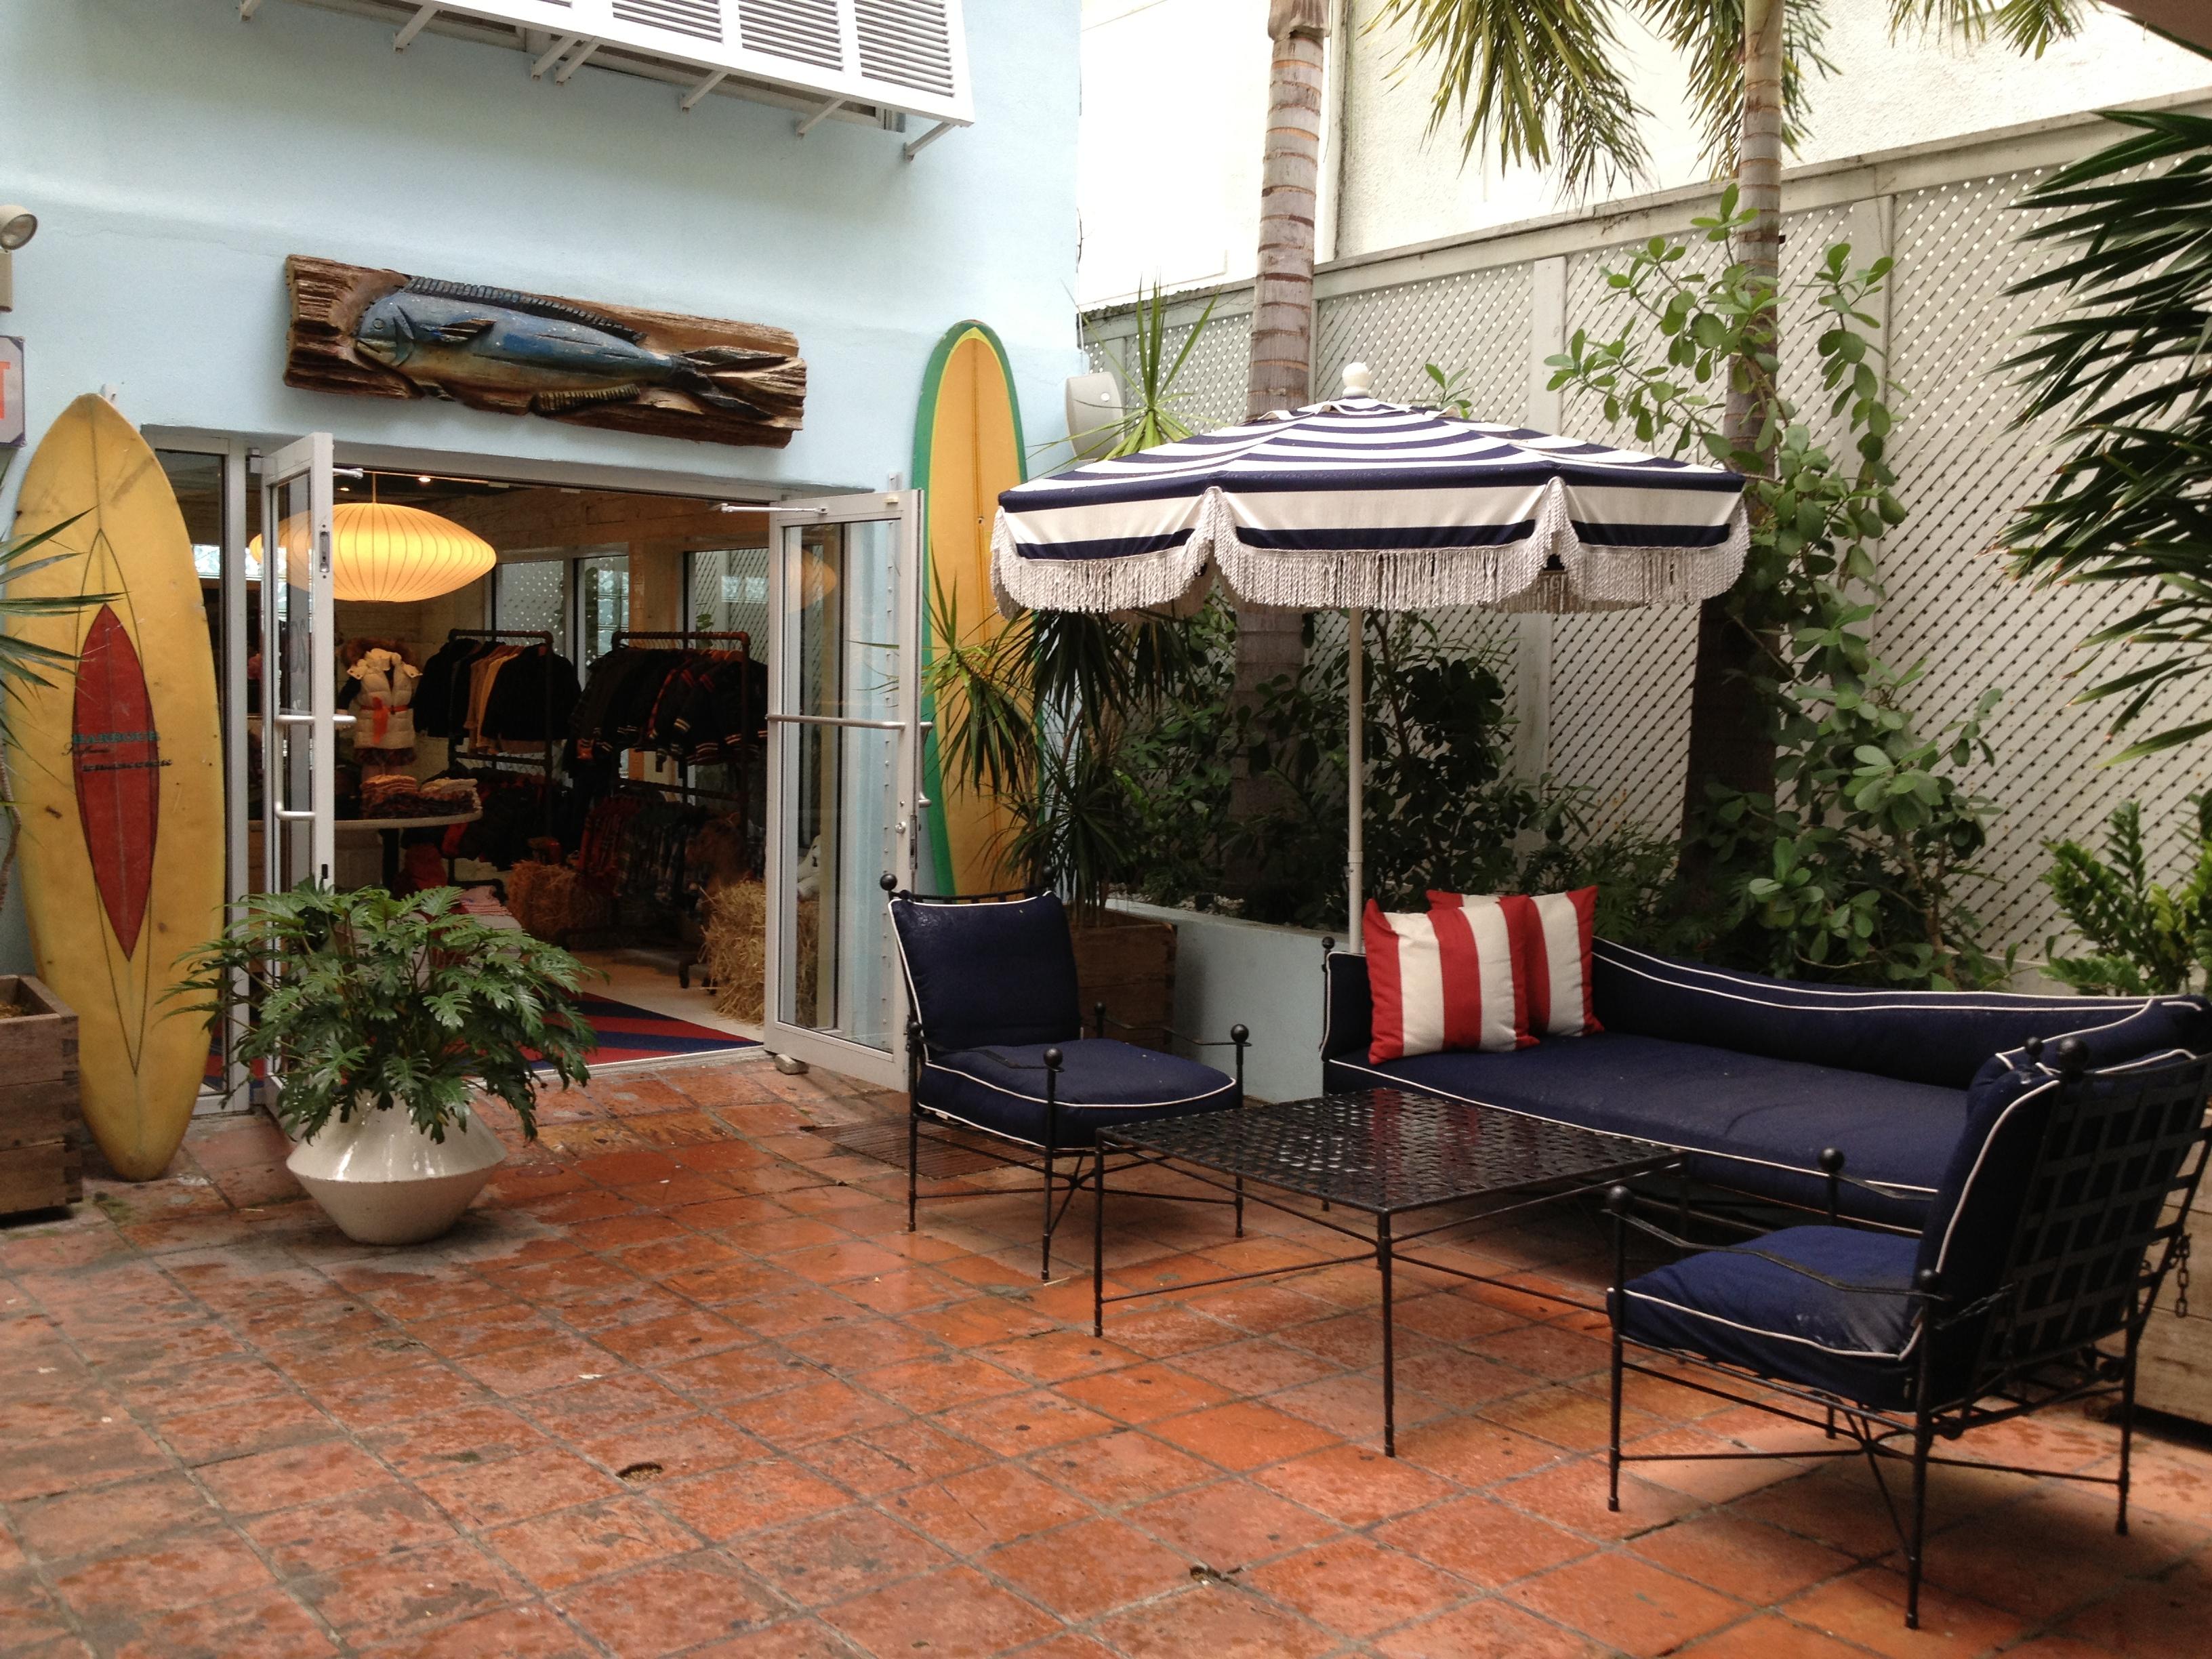 decoracao de sala lojas : decoracao de sala lojas:Decor_vintage_paraia_fazenda_ACDG (2)